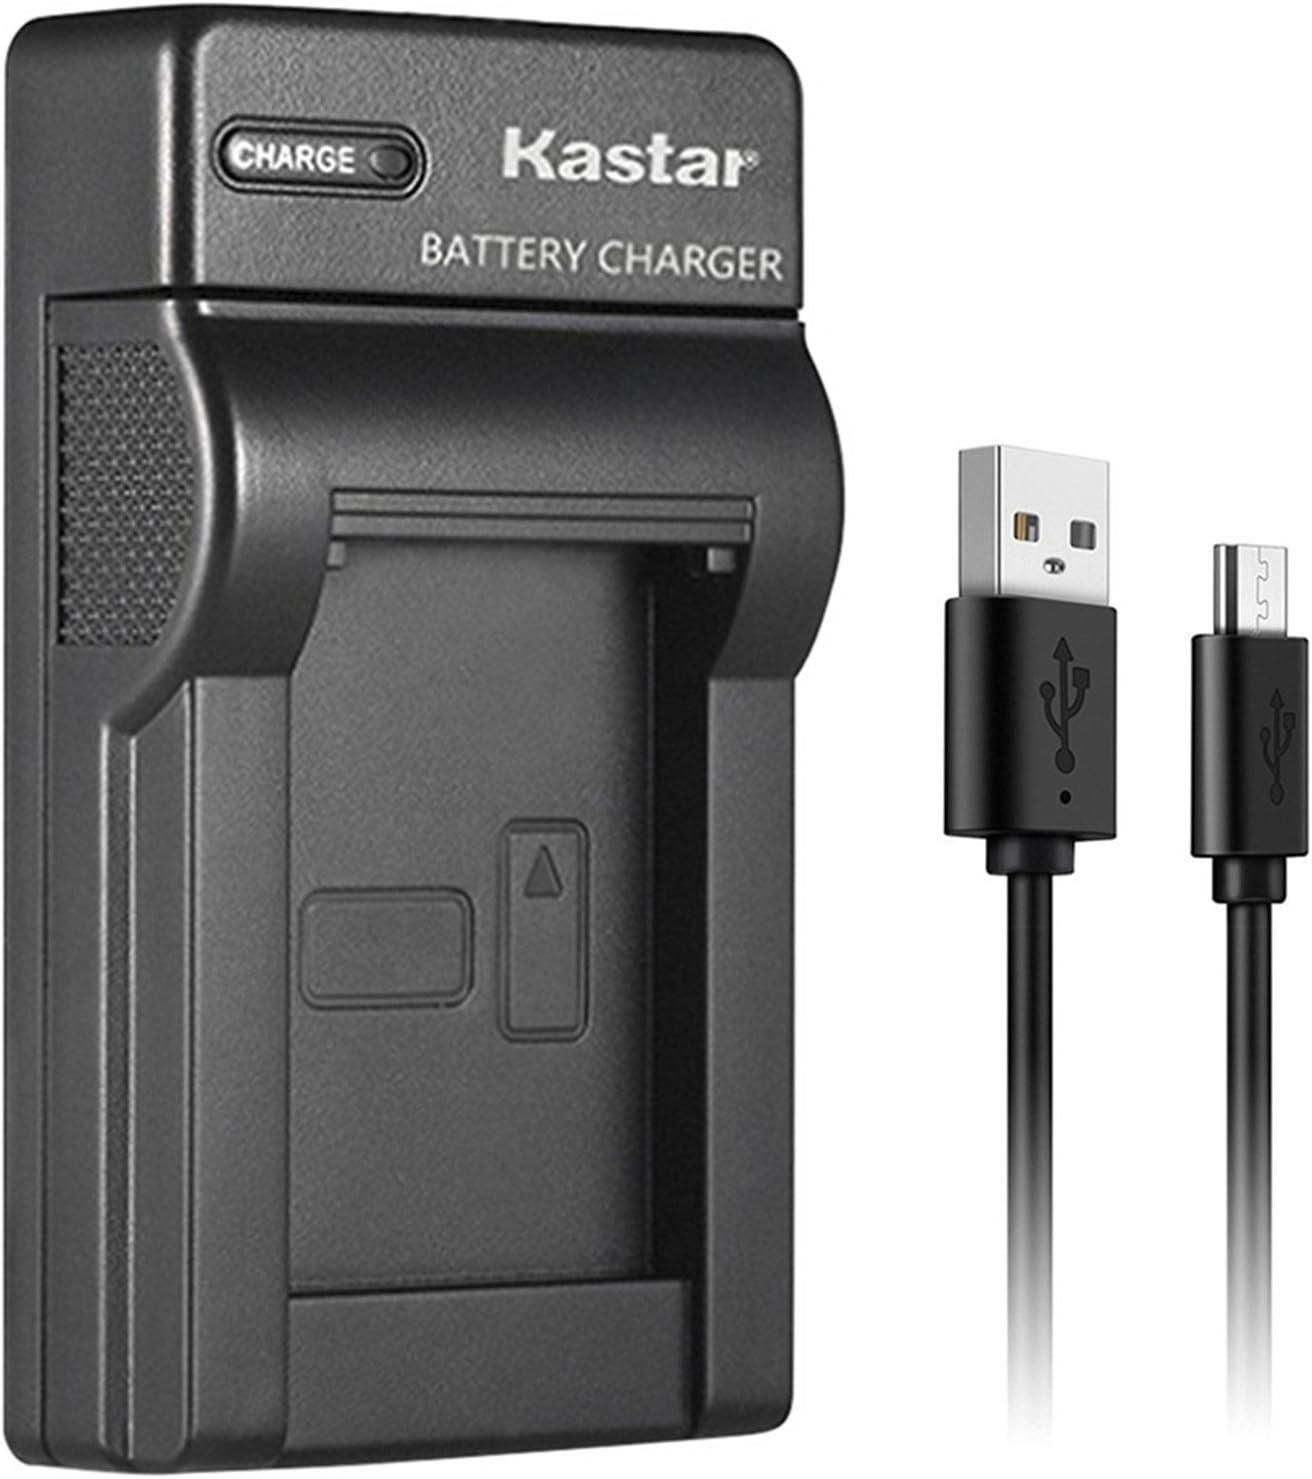 Kastar Slim USB Charger Ranking TOP10 for Olympus LI-10B and S Popular product LI-12B